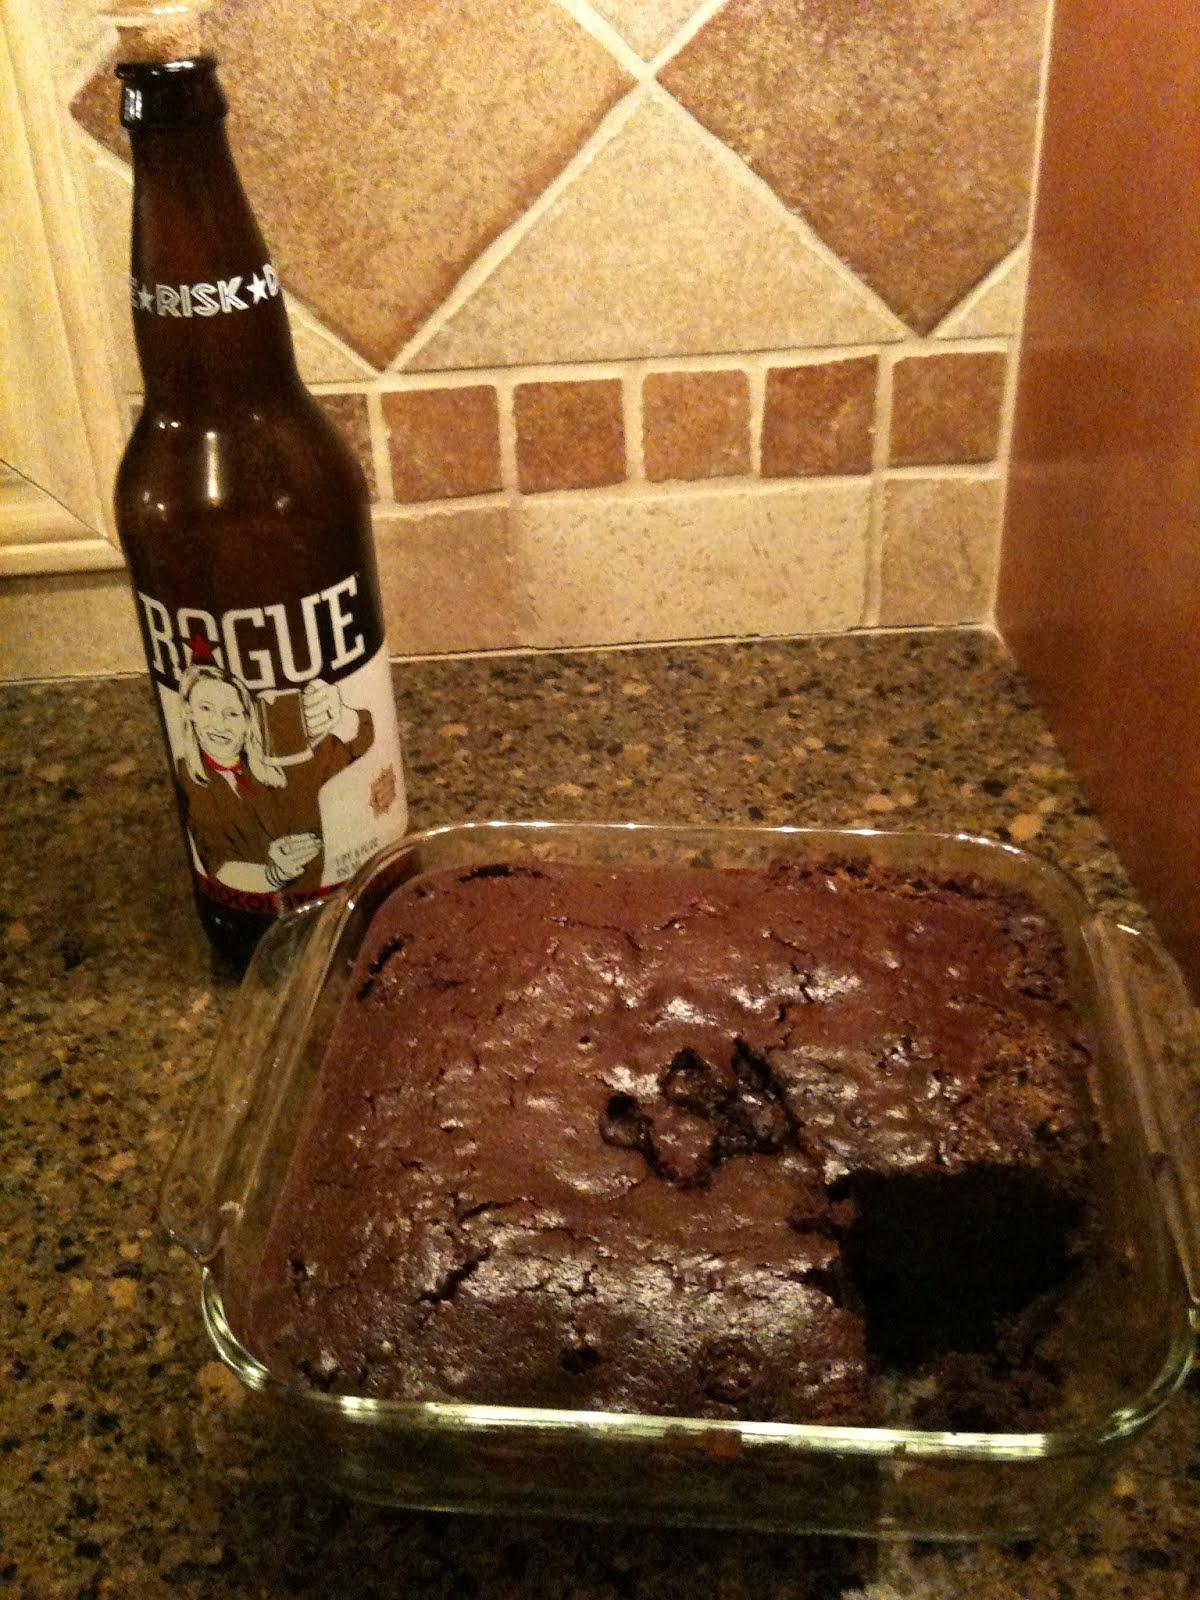 Hackknife Northeast: Rogue Chocolate Stout Brownies